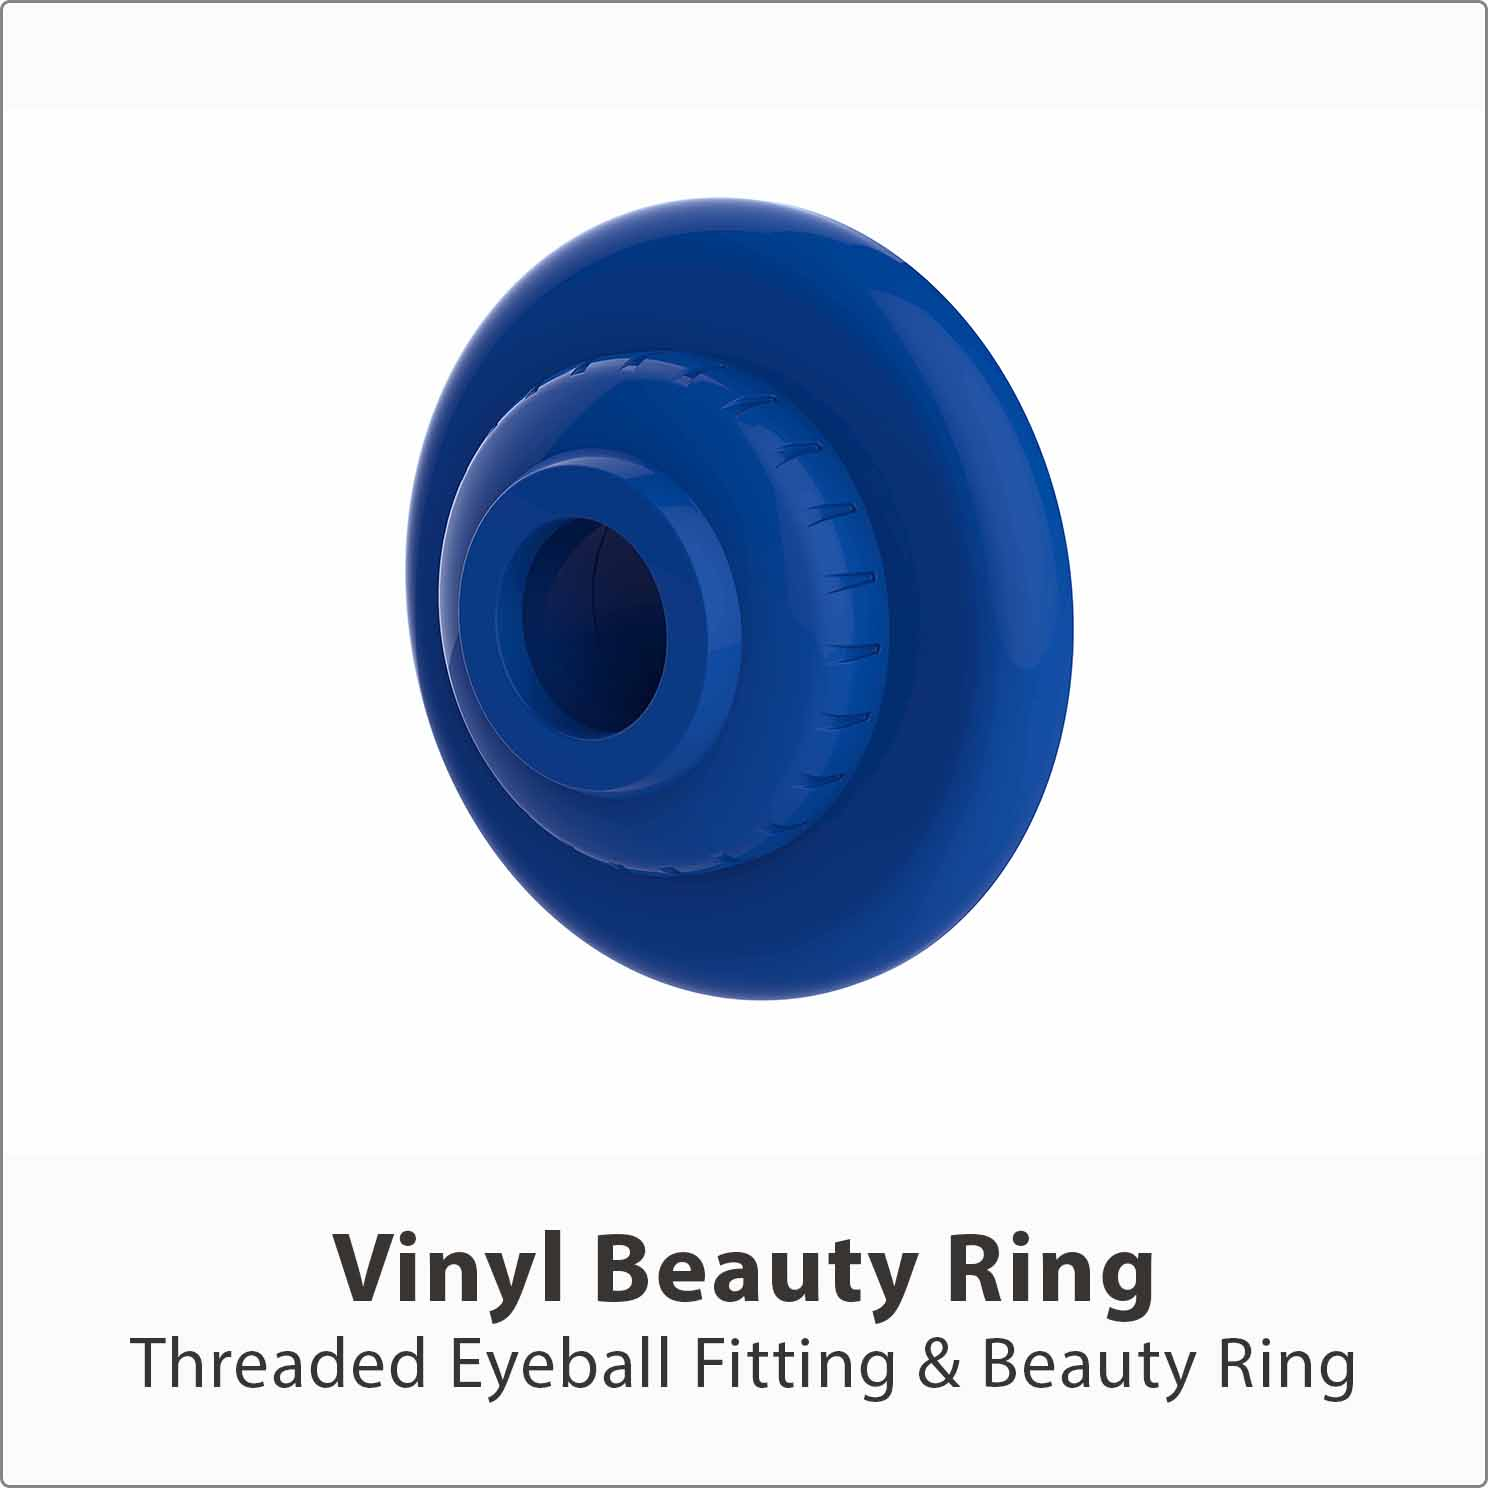 Vinyl Beauty Ring.jpg